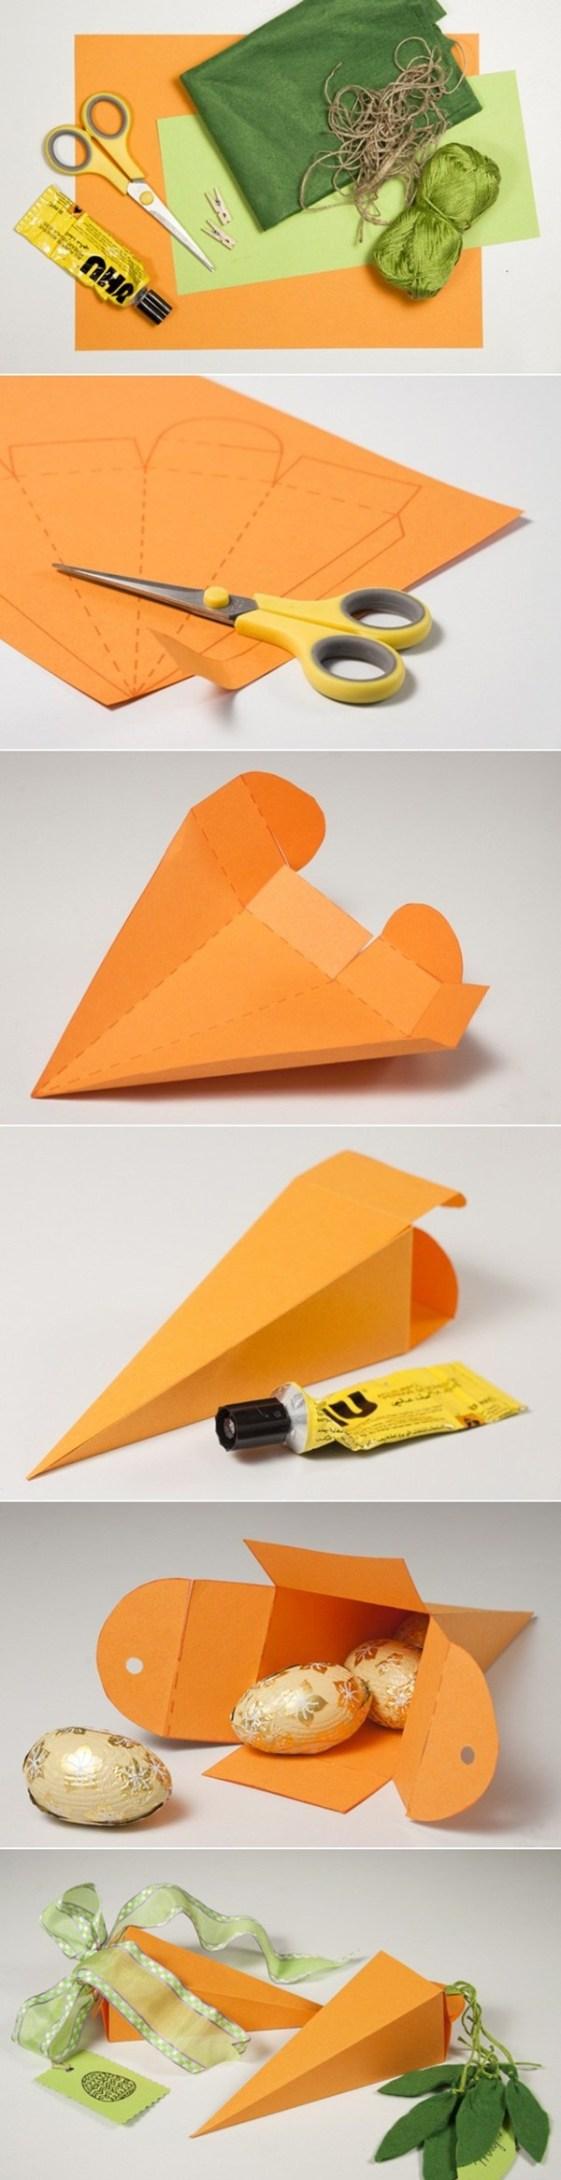 diy-easter-treat-bags-kids-carrot-shaped-box-tutorial